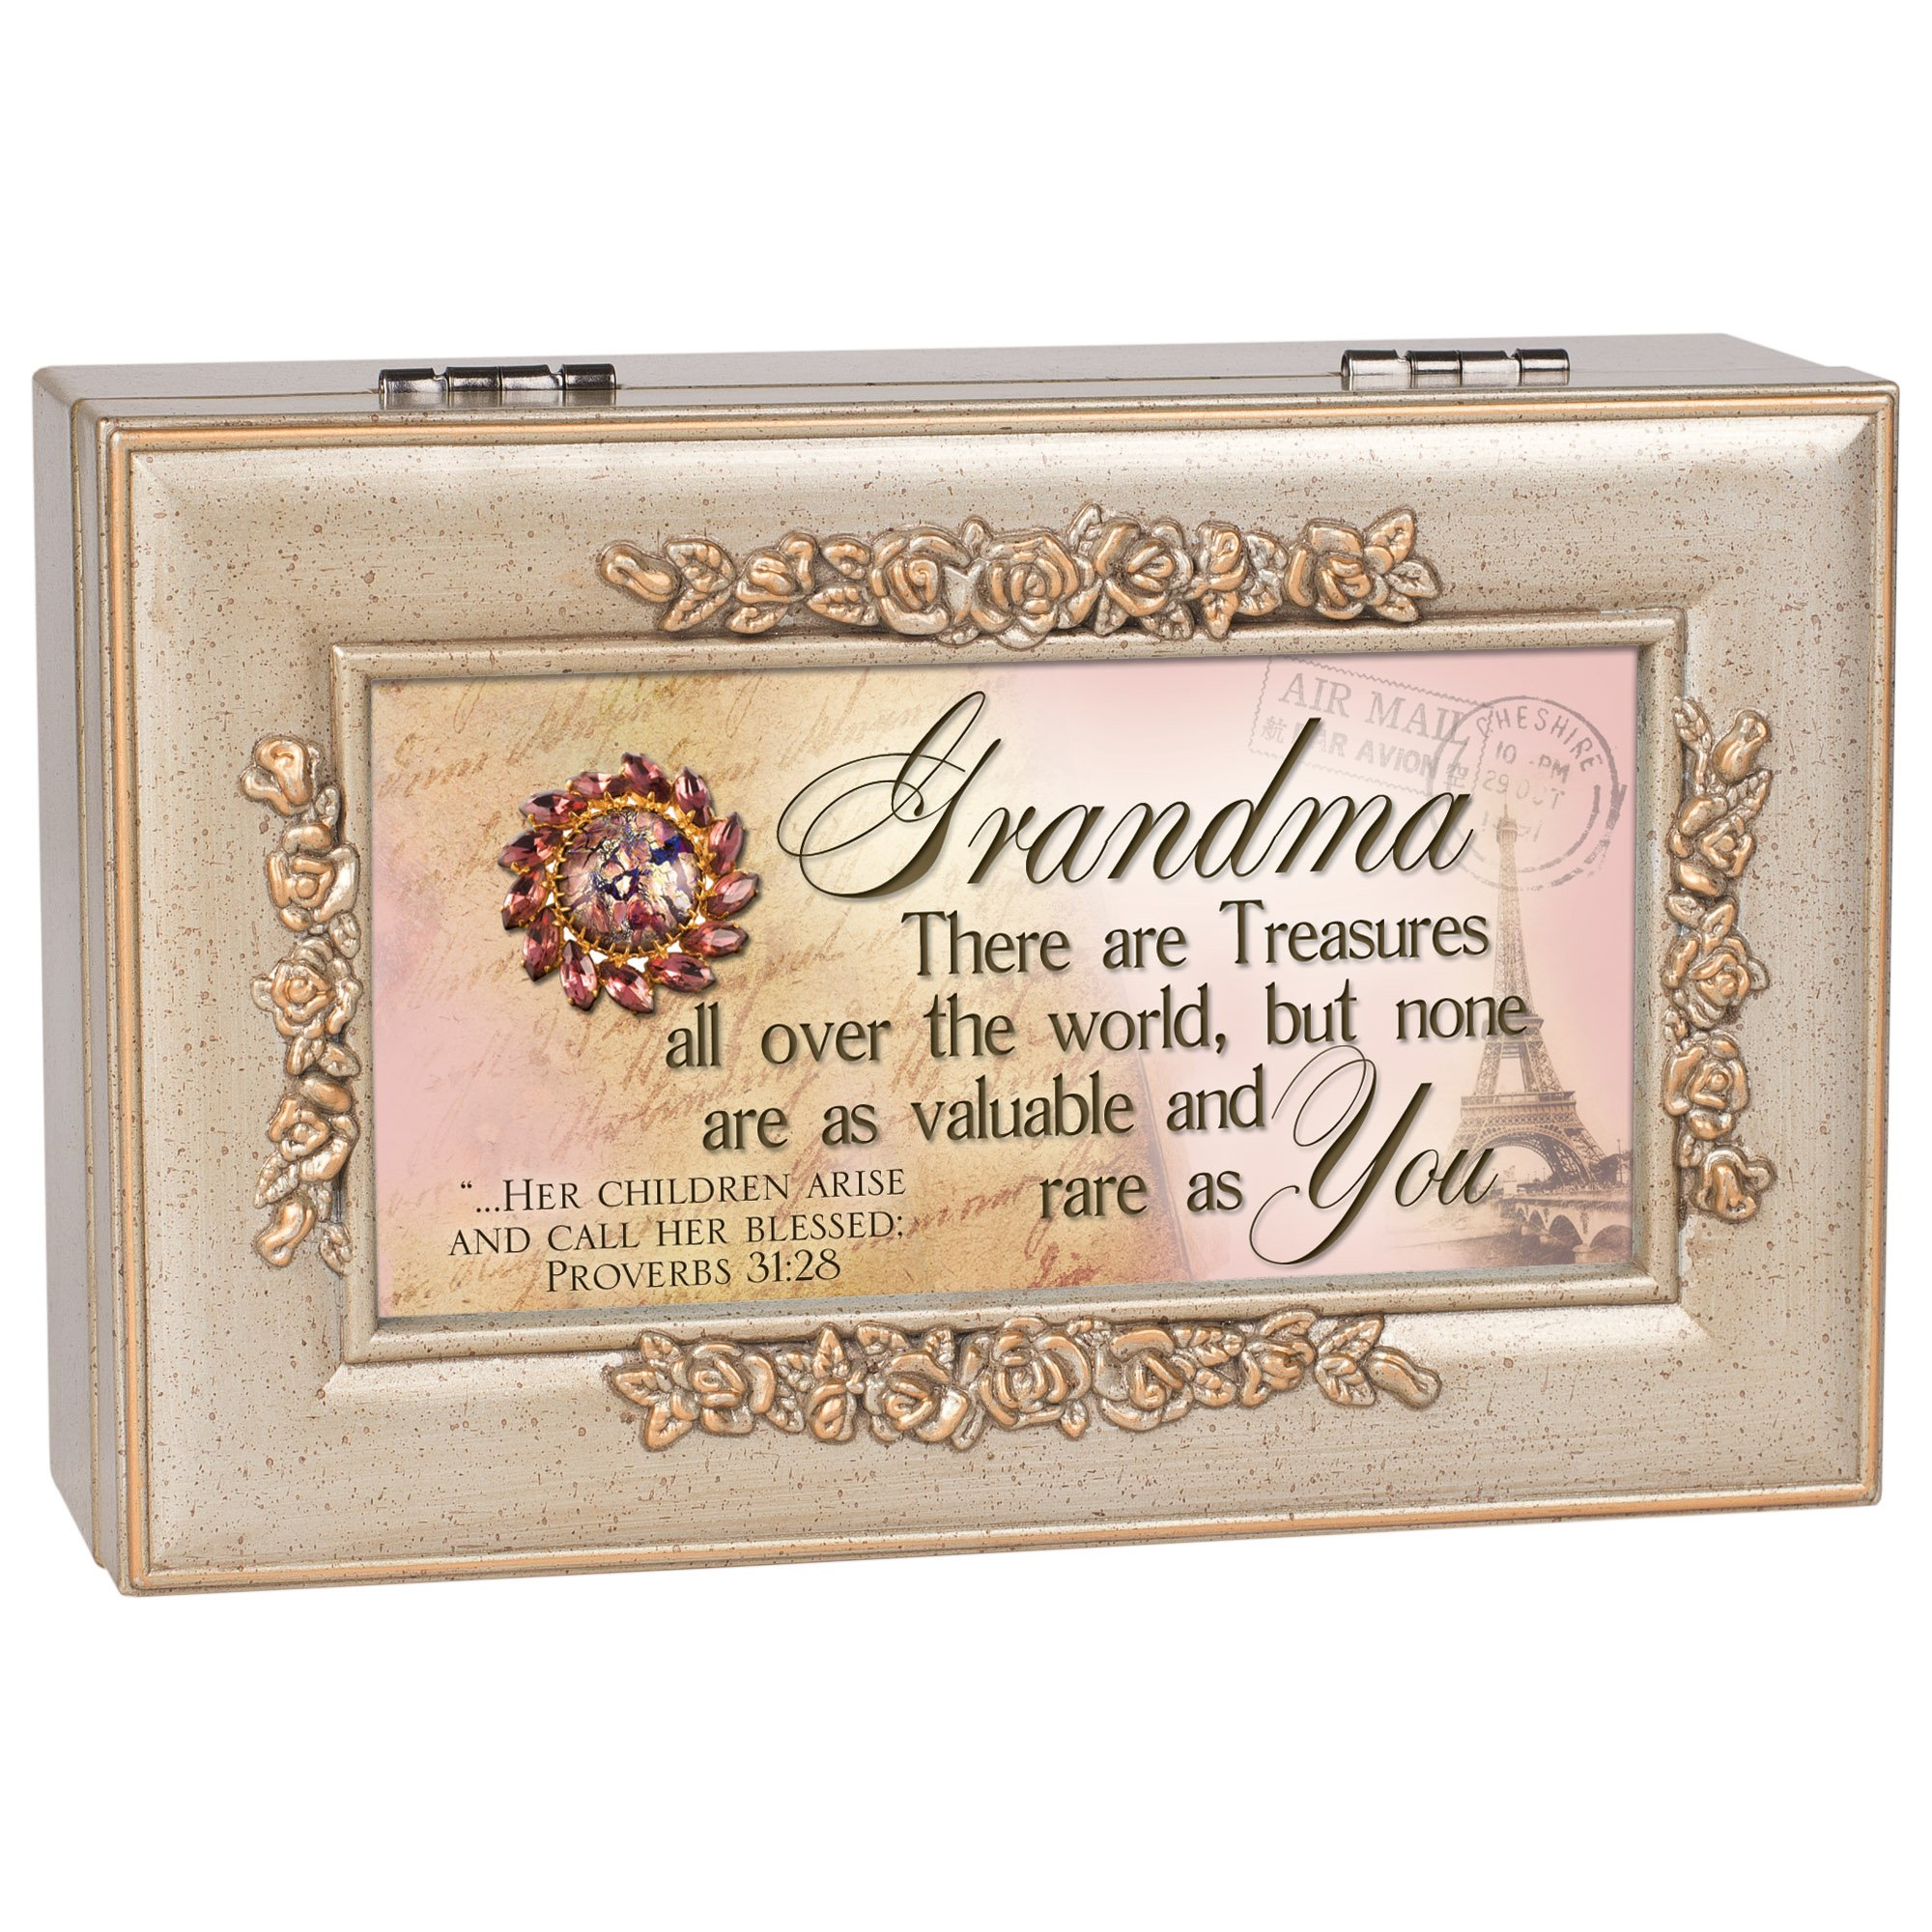 galleon cottage garden grandma grandmother champagne silver petite rose music box jewelry. Black Bedroom Furniture Sets. Home Design Ideas